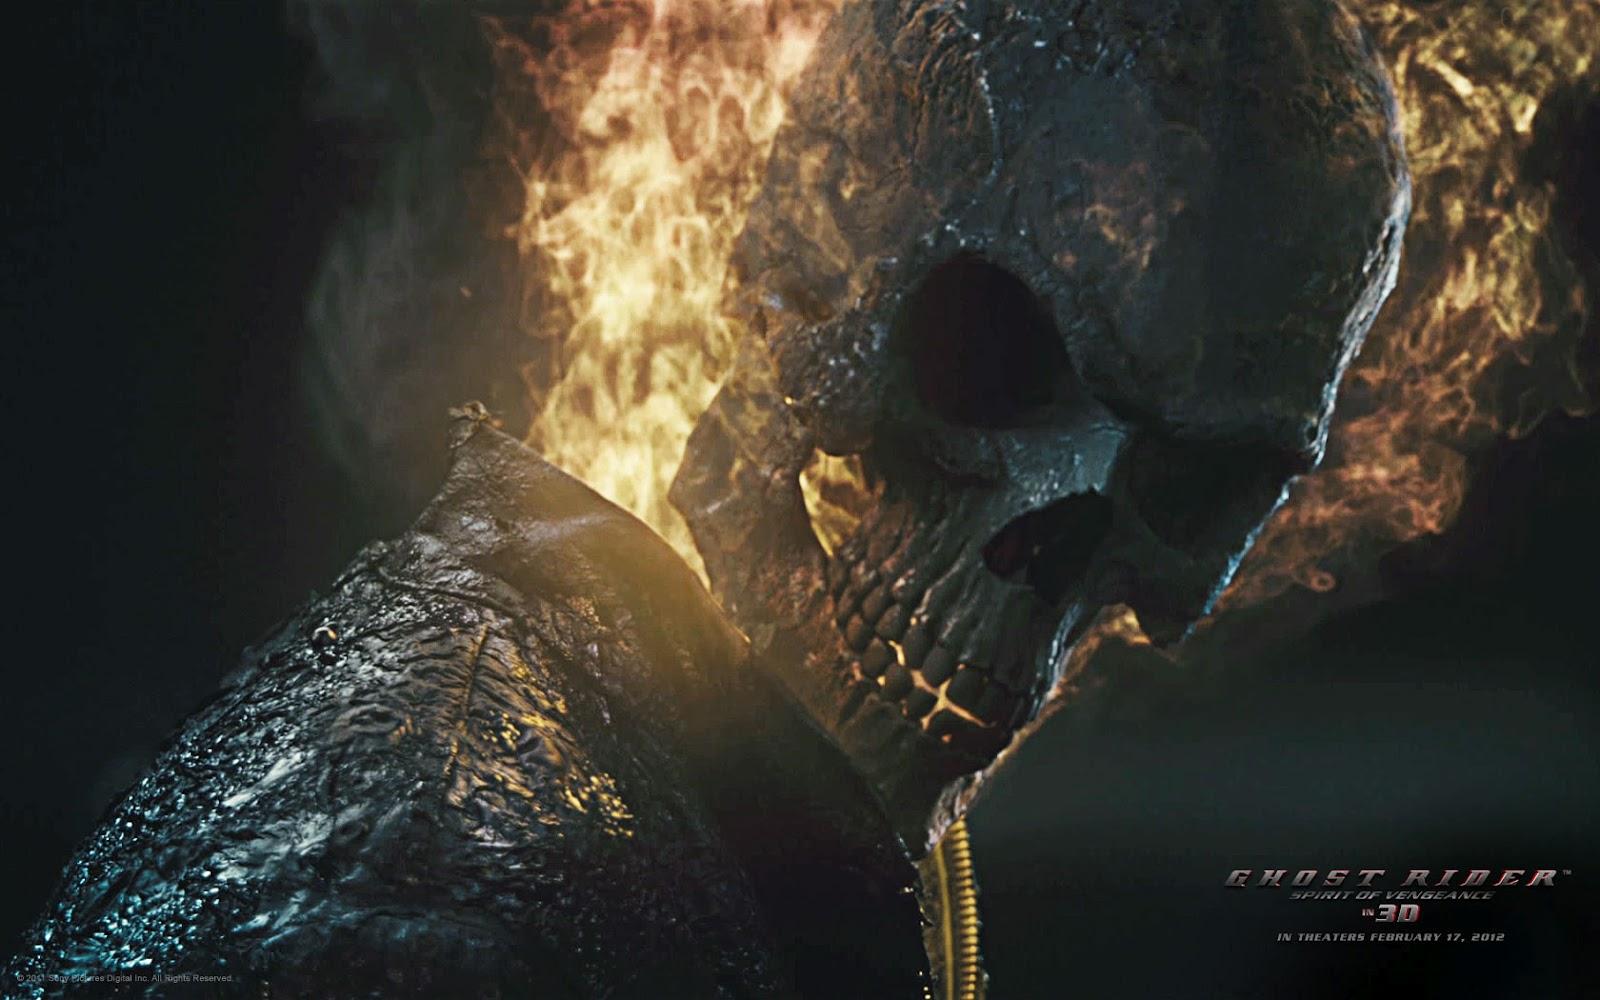 http://3.bp.blogspot.com/--FmTAeJjd9w/T0BQ72Vo8lI/AAAAAAAAAuY/rxX6oKEviBk/s1600/Ghost_Rider-_Spirit_of_Vengeance_Wallpaper_1_1024.jpg